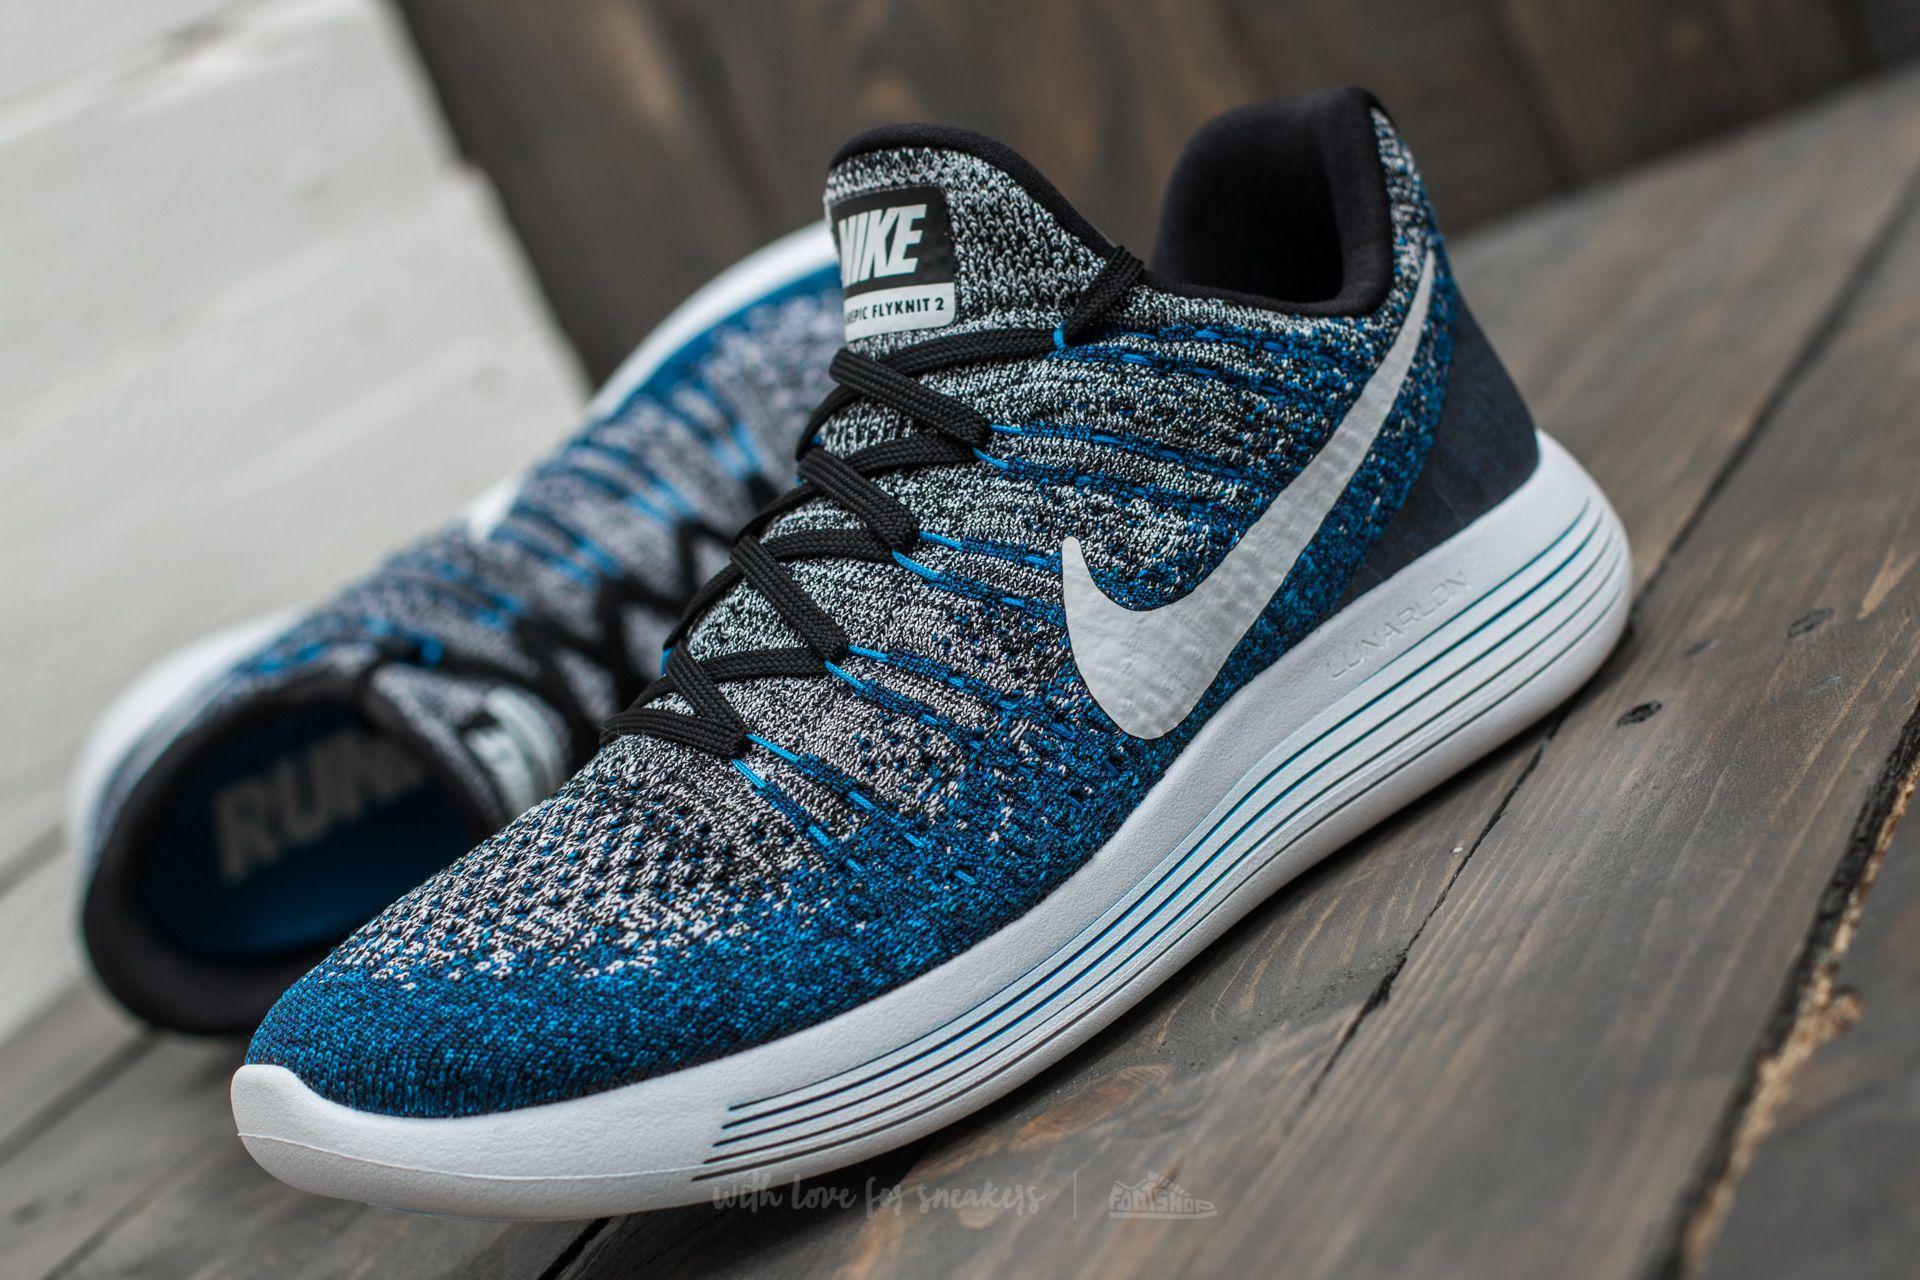 Nike Lunarepic Low Flyknit 2 Black White Photo Blue | Footshop